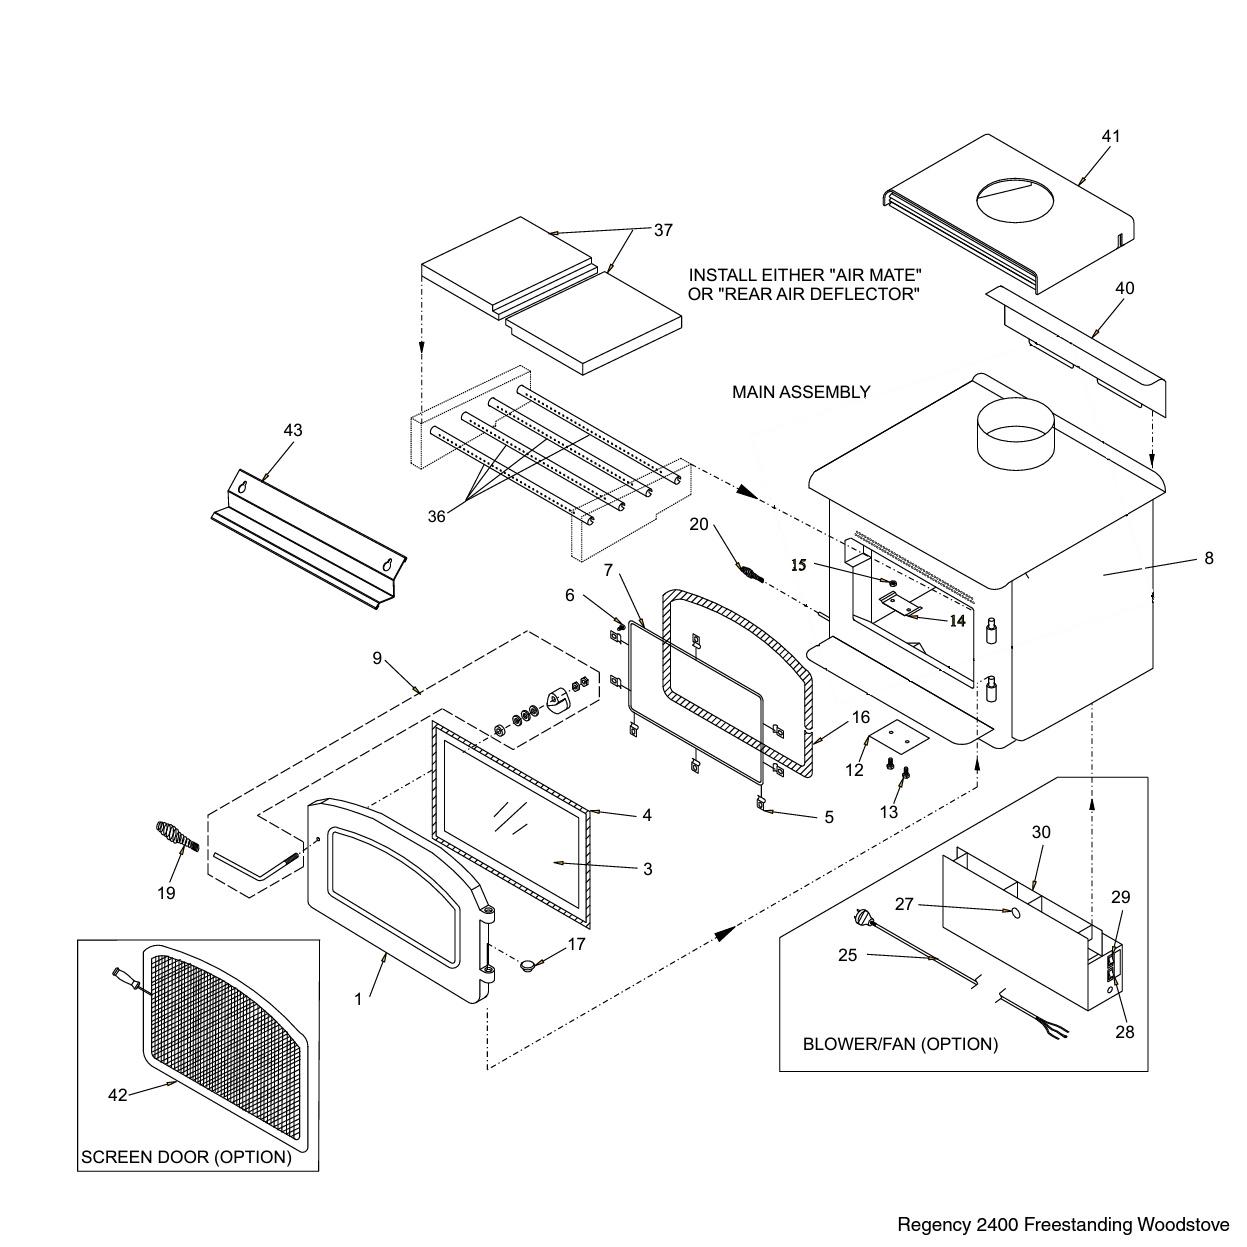 Regency F Wood Stove Main Assembly Parts